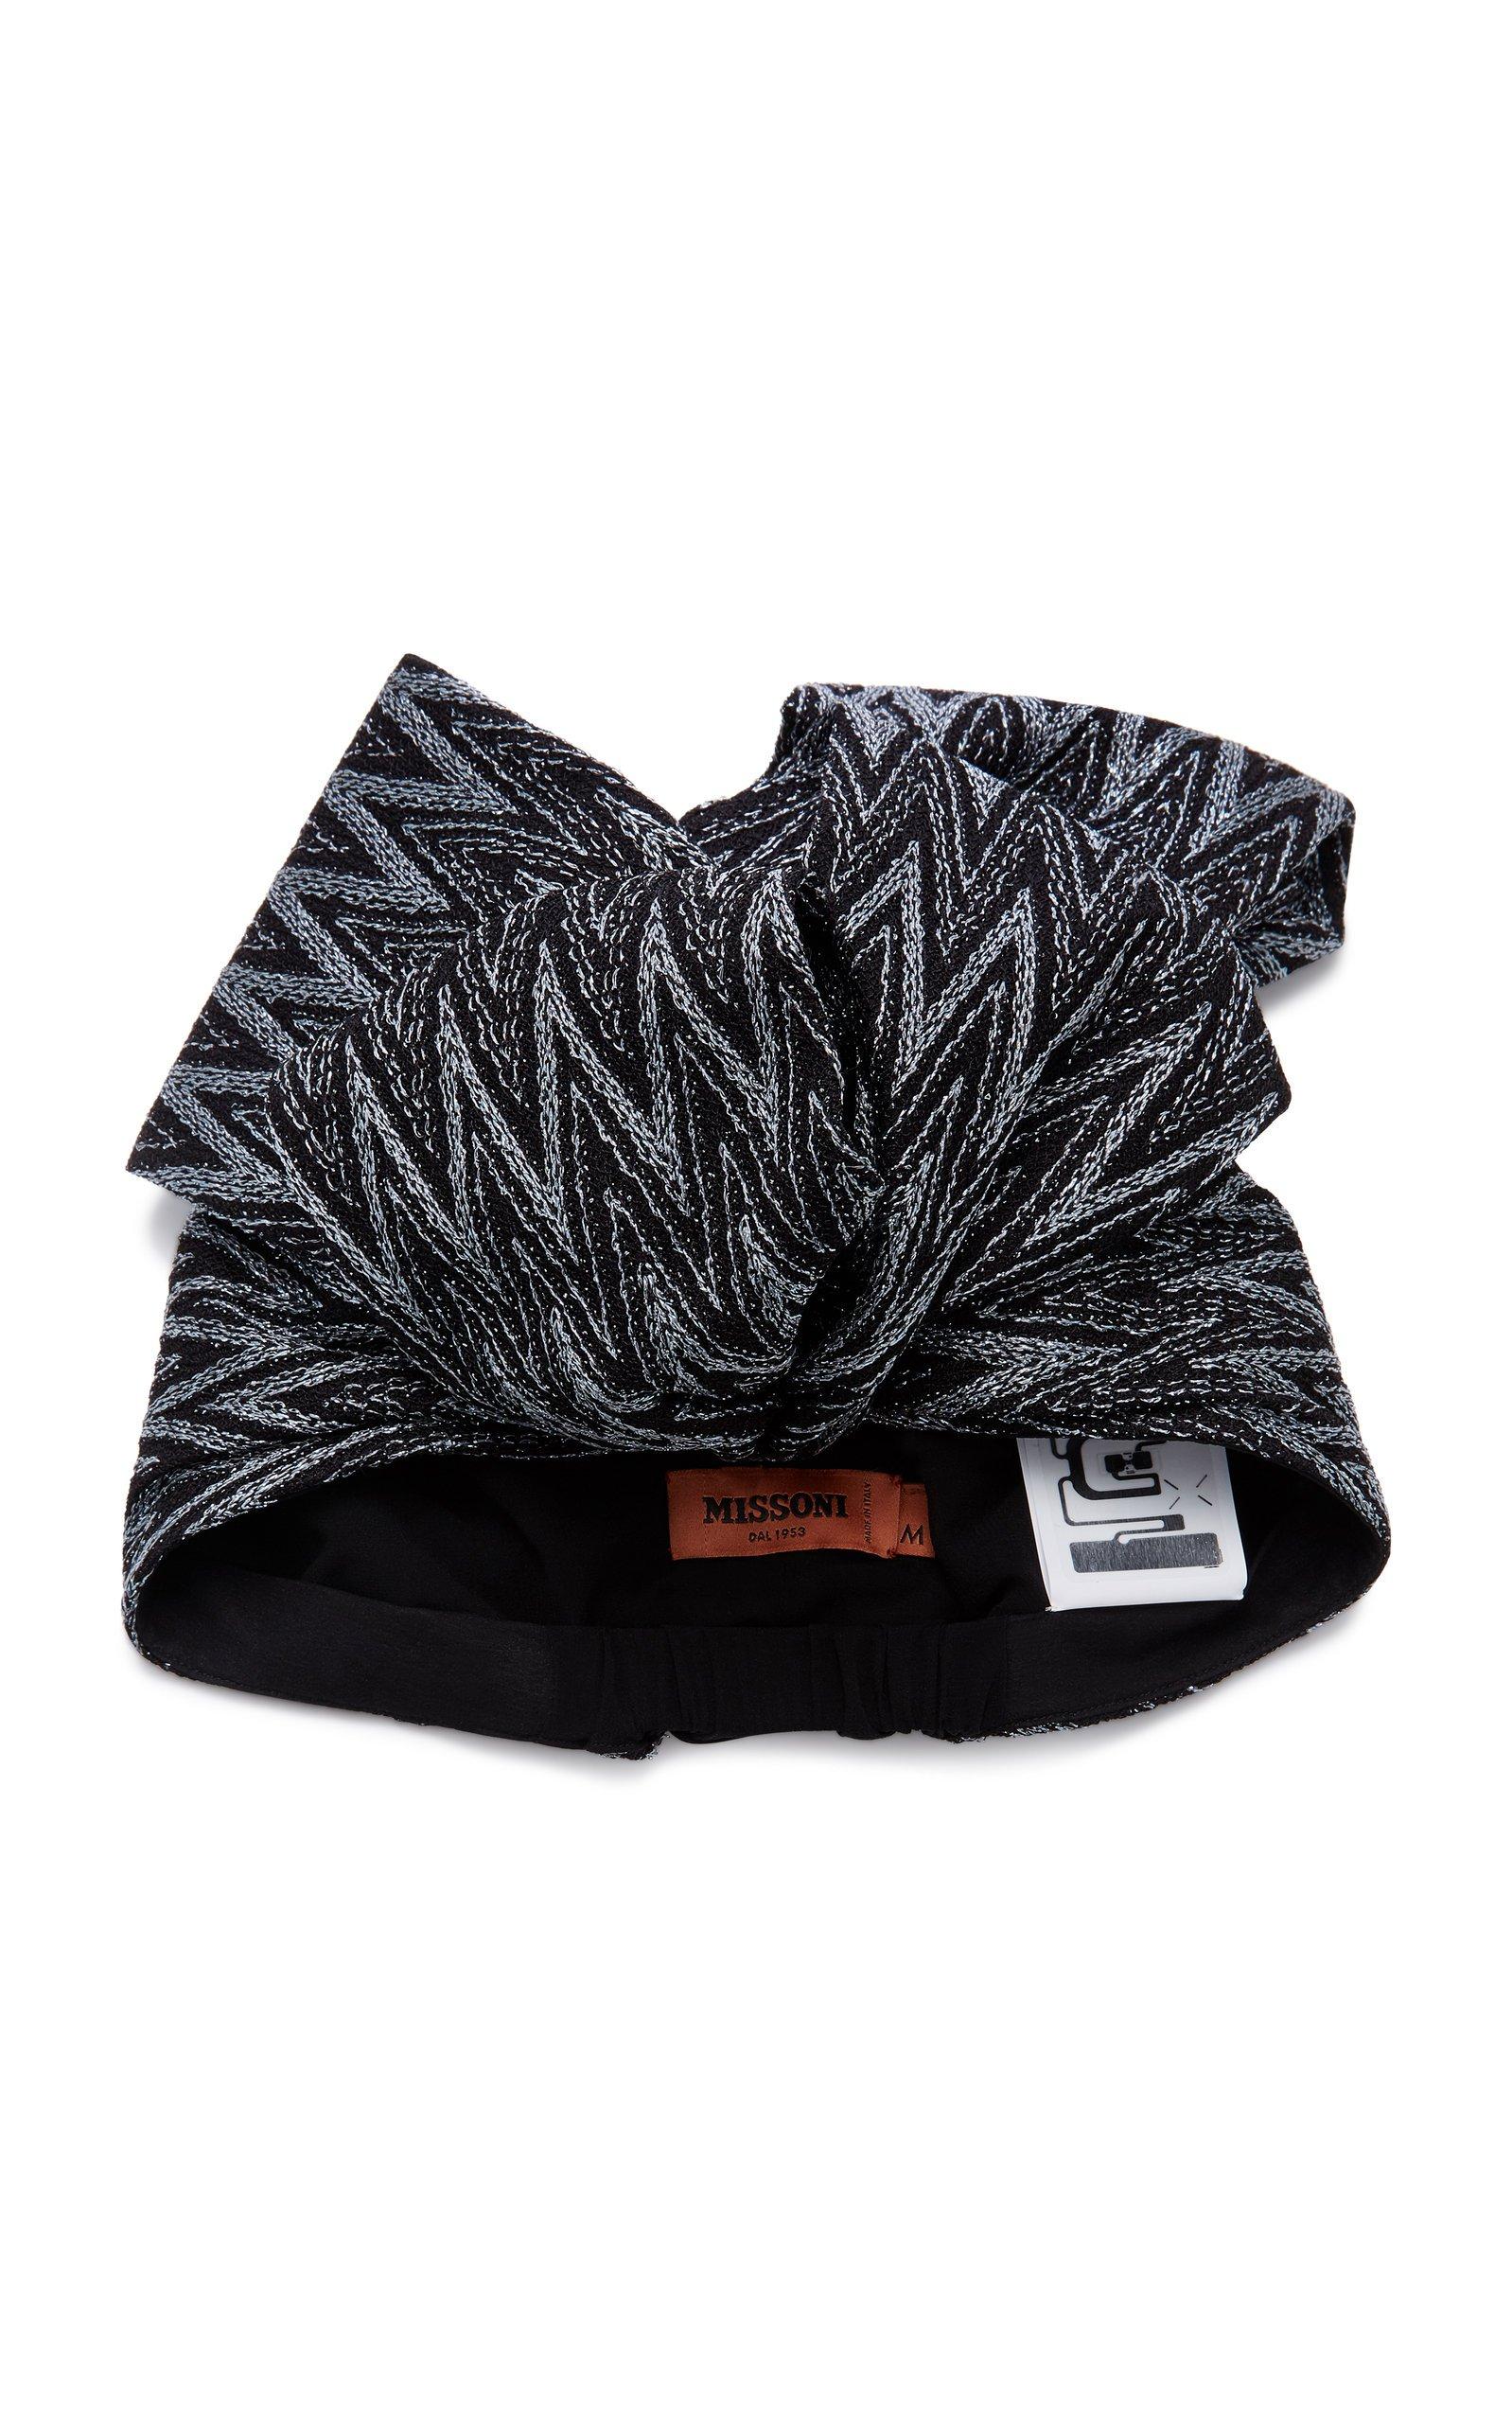 Missoni Metallic Crochet-Knit Headwrap